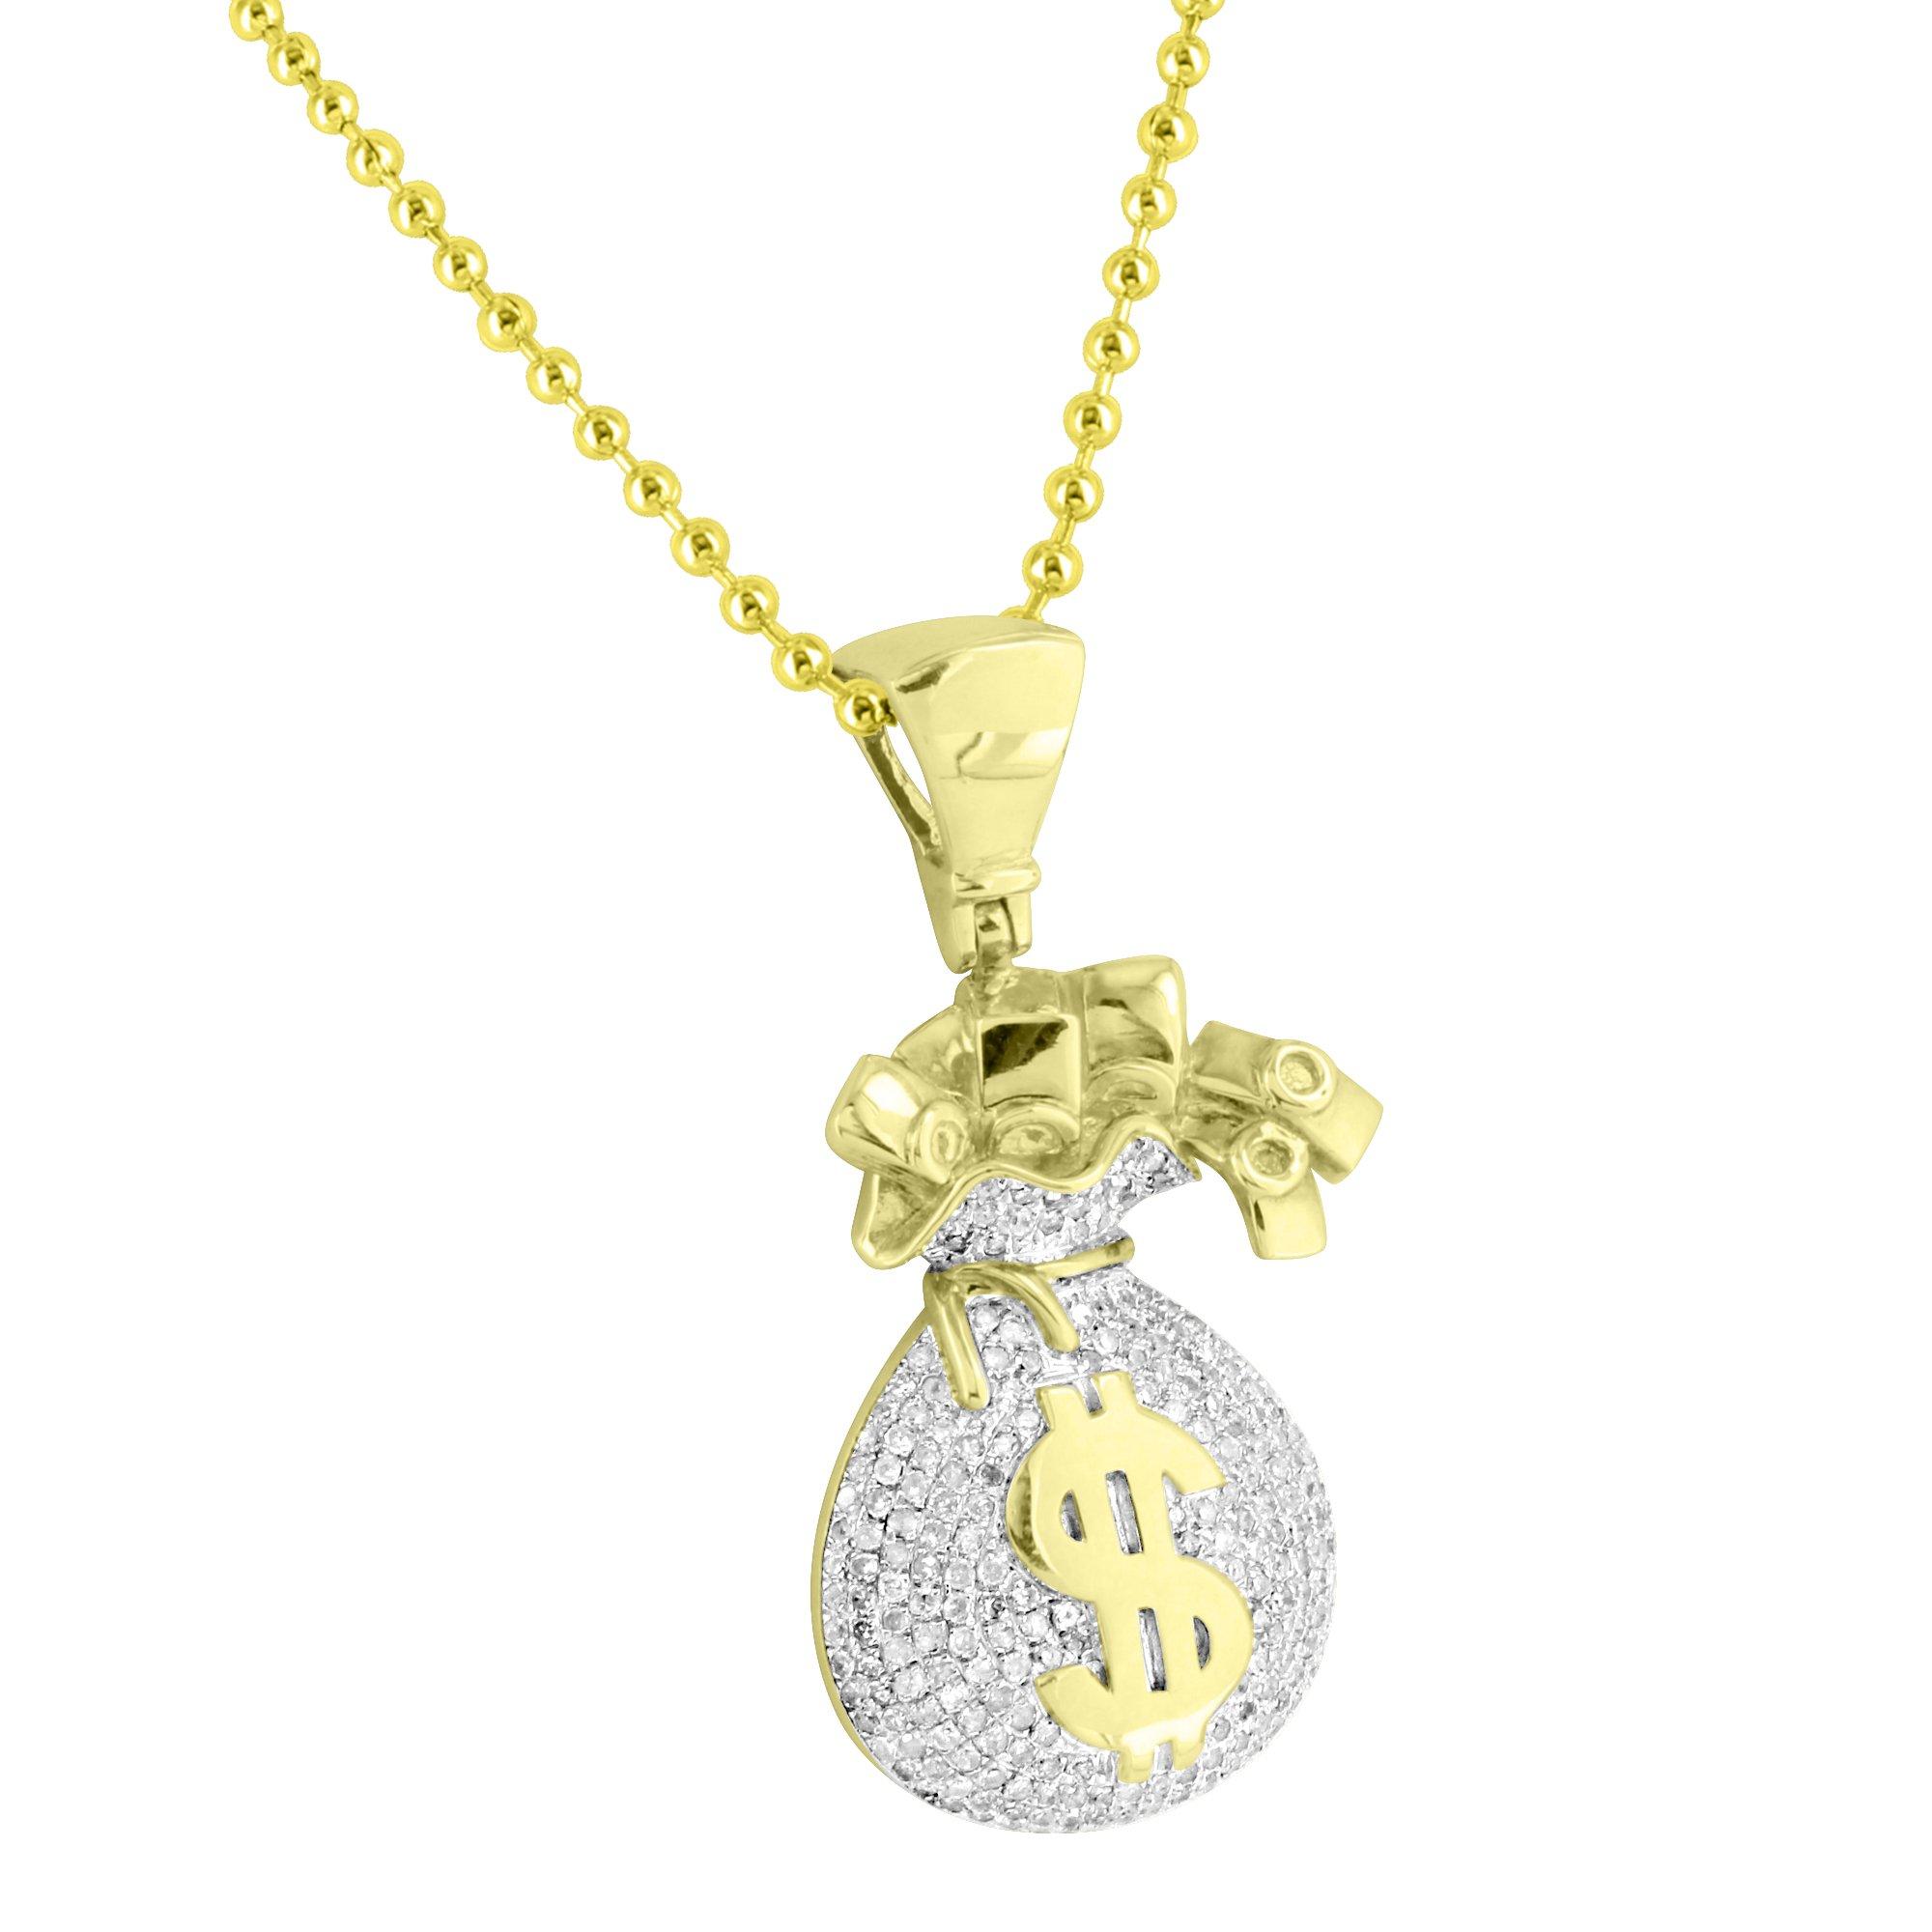 Money Bag Design Pendant 14k Gold Over Sterling Silver 1.19 CT Diamonds Bead Chain